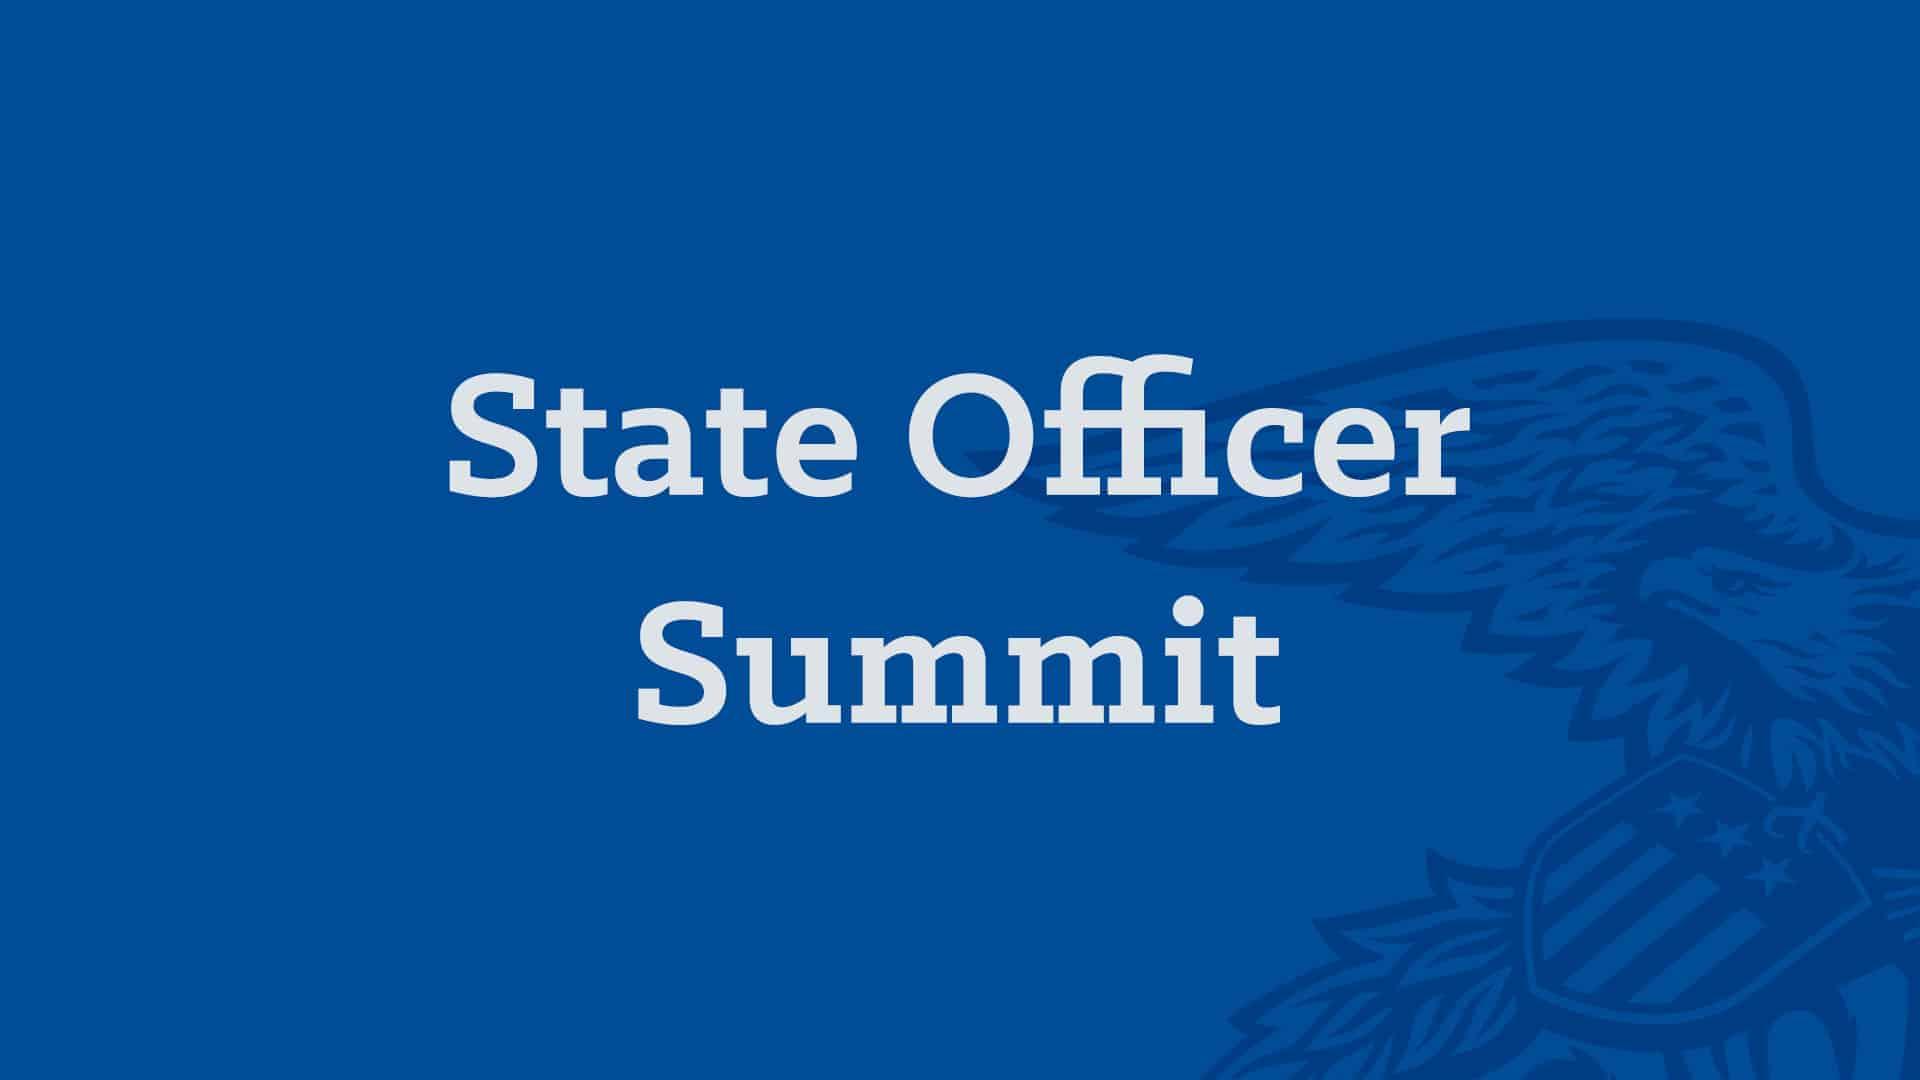 State Officer Summit